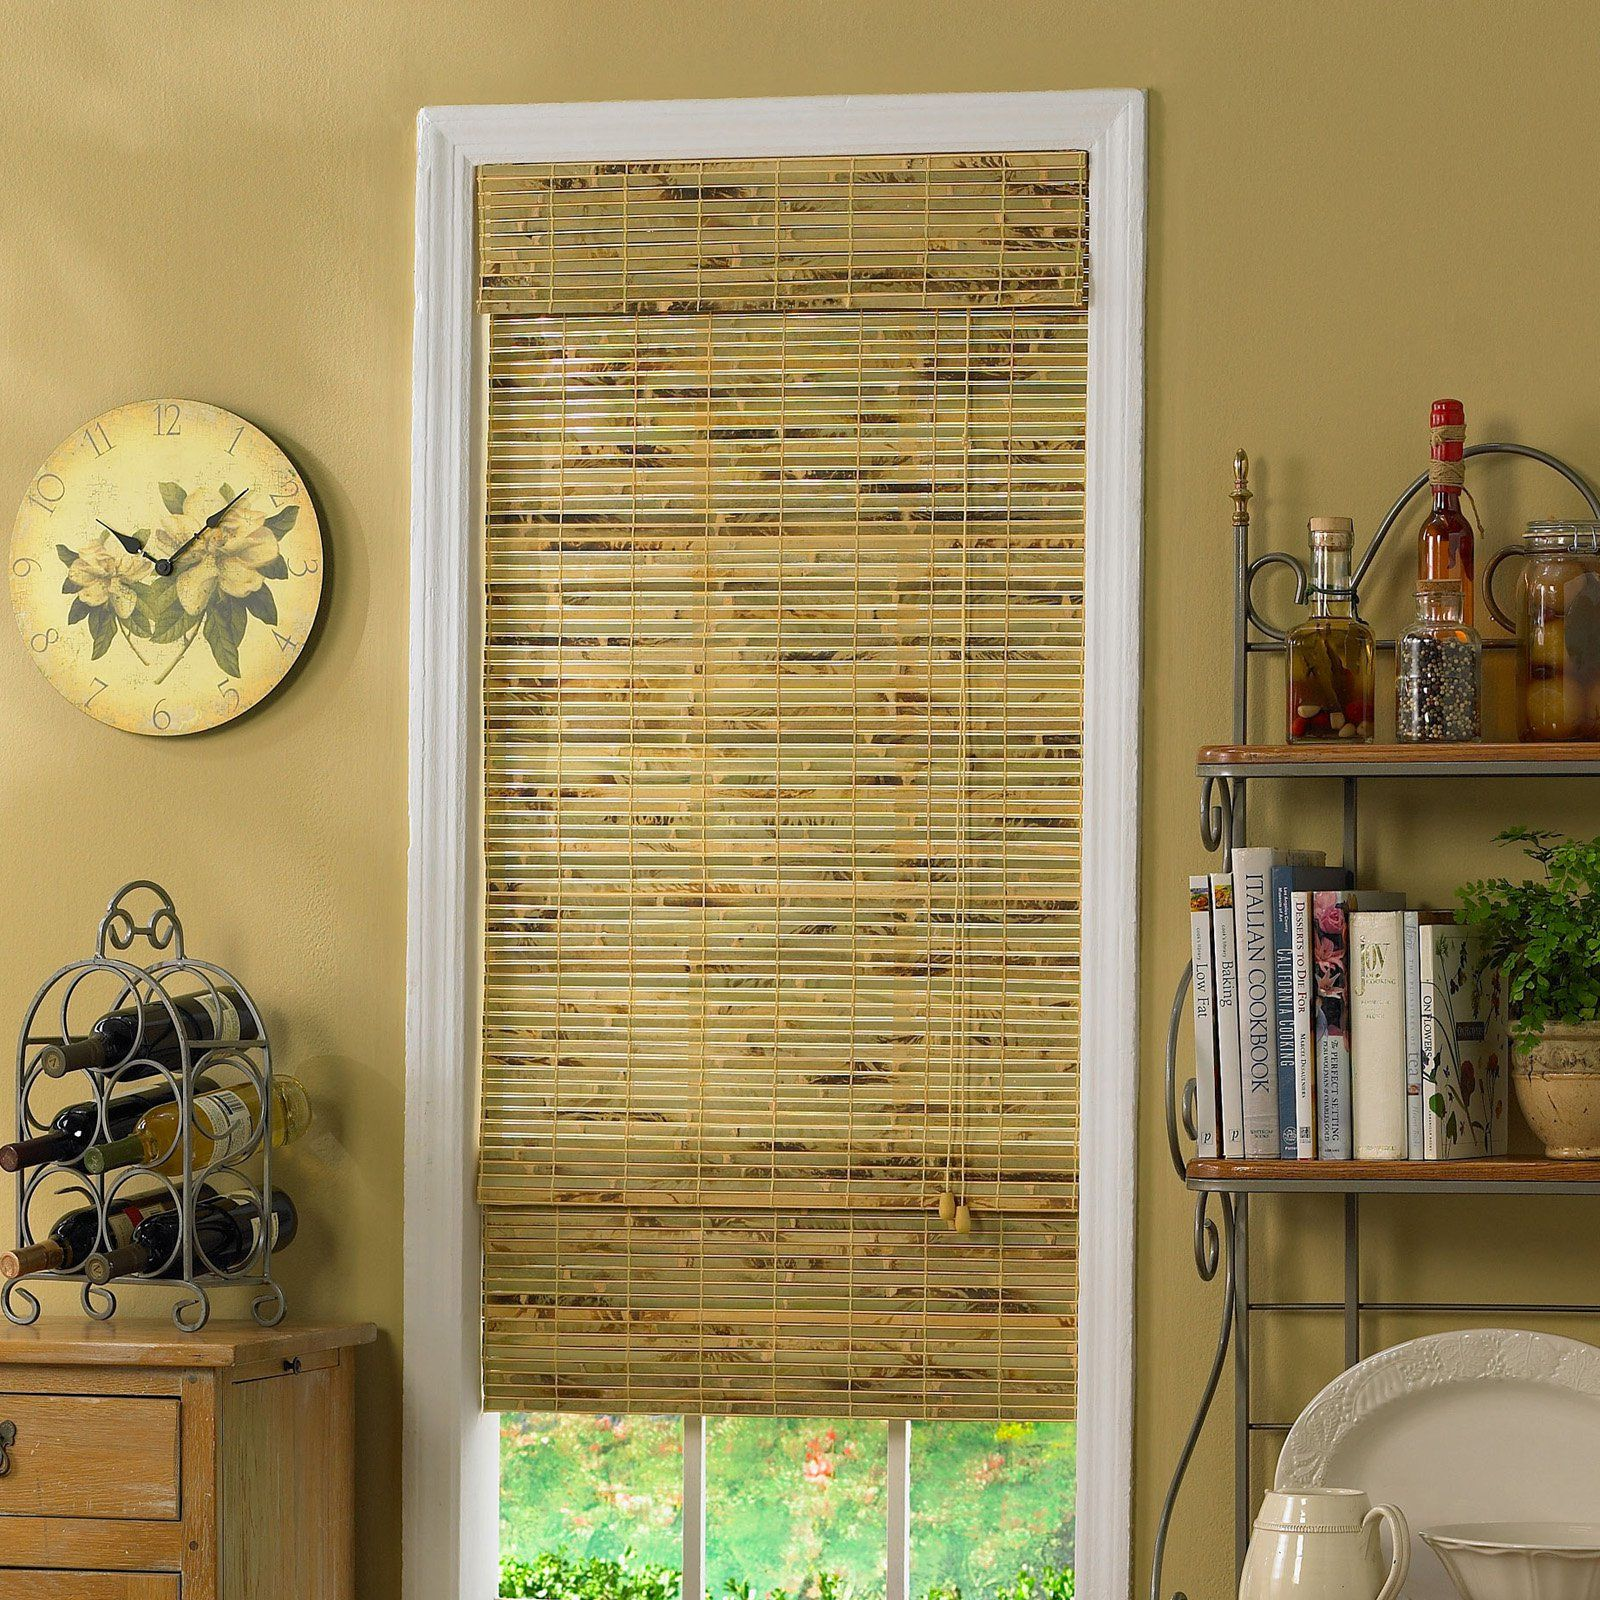 Radiance kona indooroutdoor woven wood bamboo roman shade with in